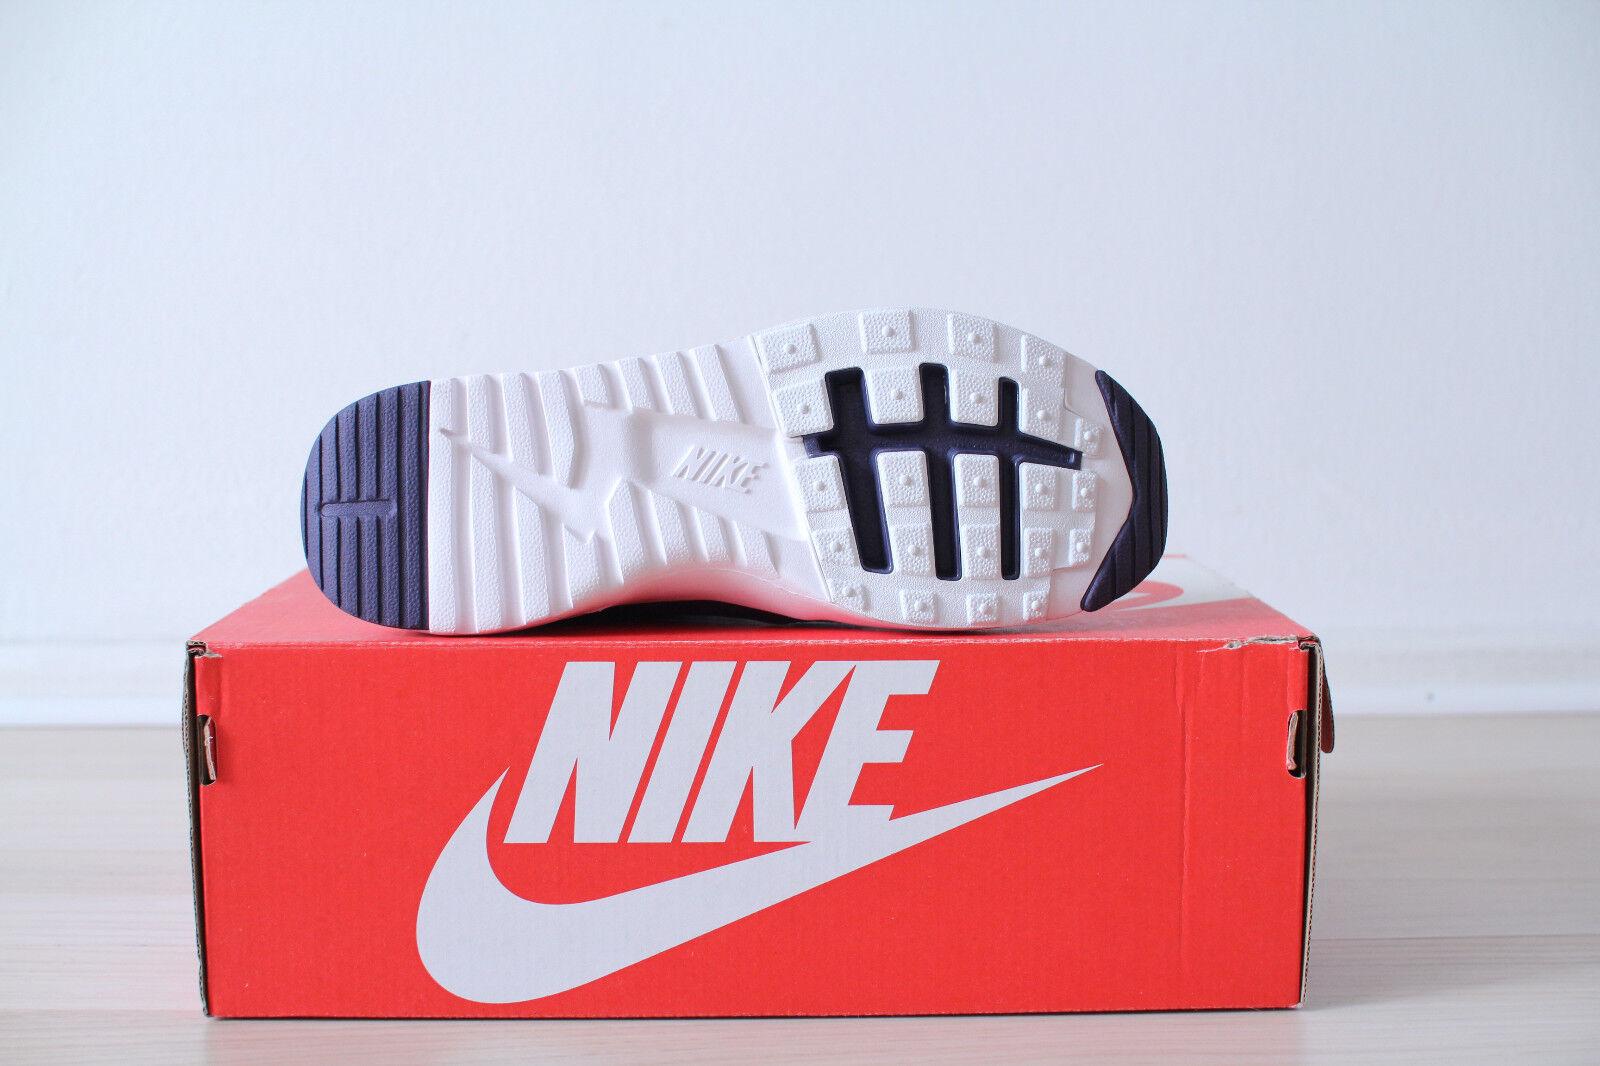 Nike Nike Nike Air Max Thea Ultra Flyknit Lila Weiß Gr. 38,39,40,41 NEU & OVP adfbfc